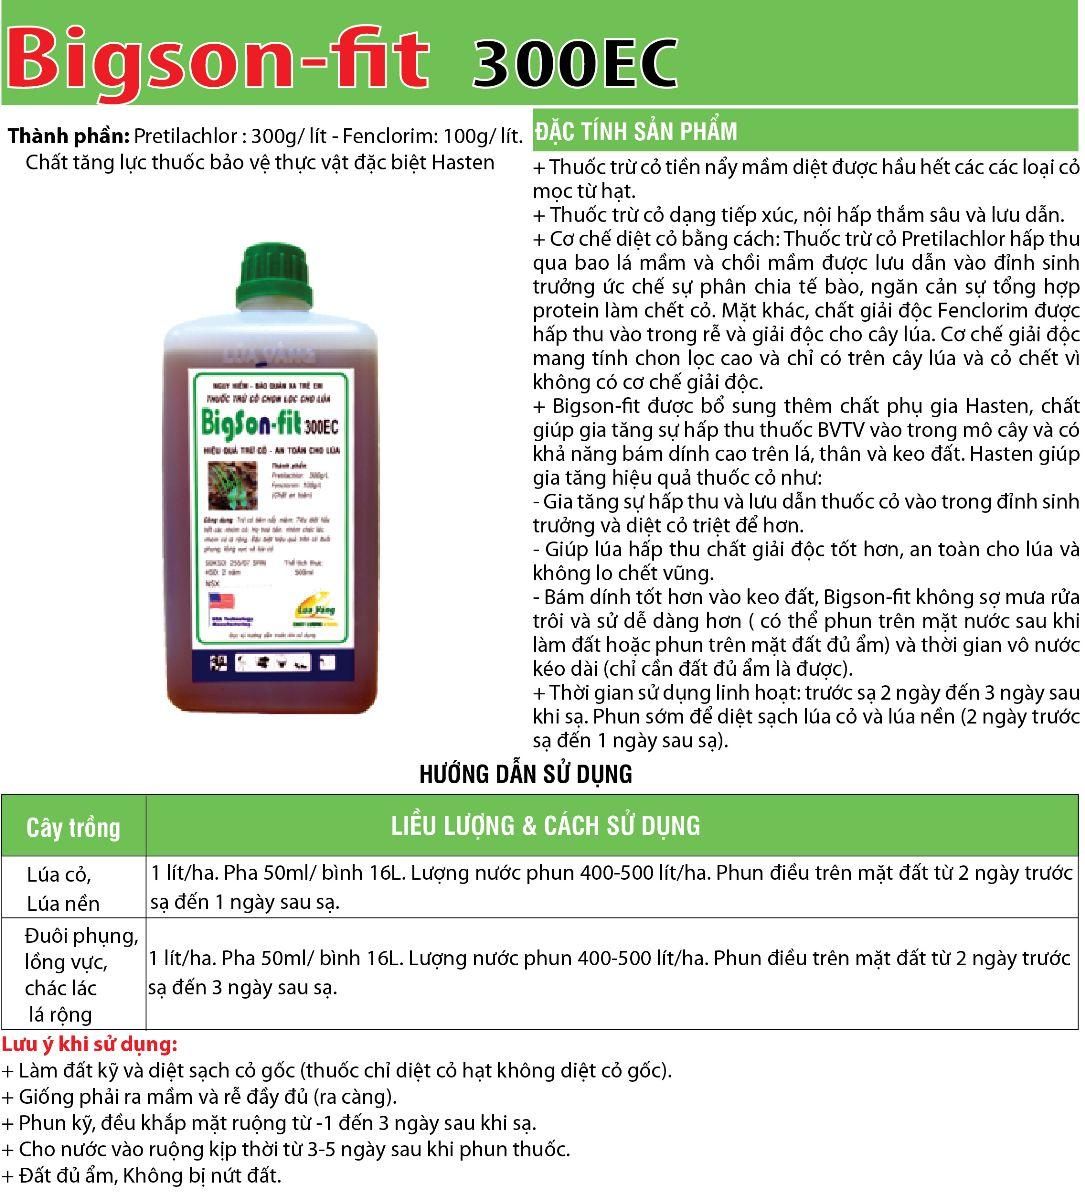 Thuốc cỏ lúa tiền nẩy mầm Bigson-fit 300EC